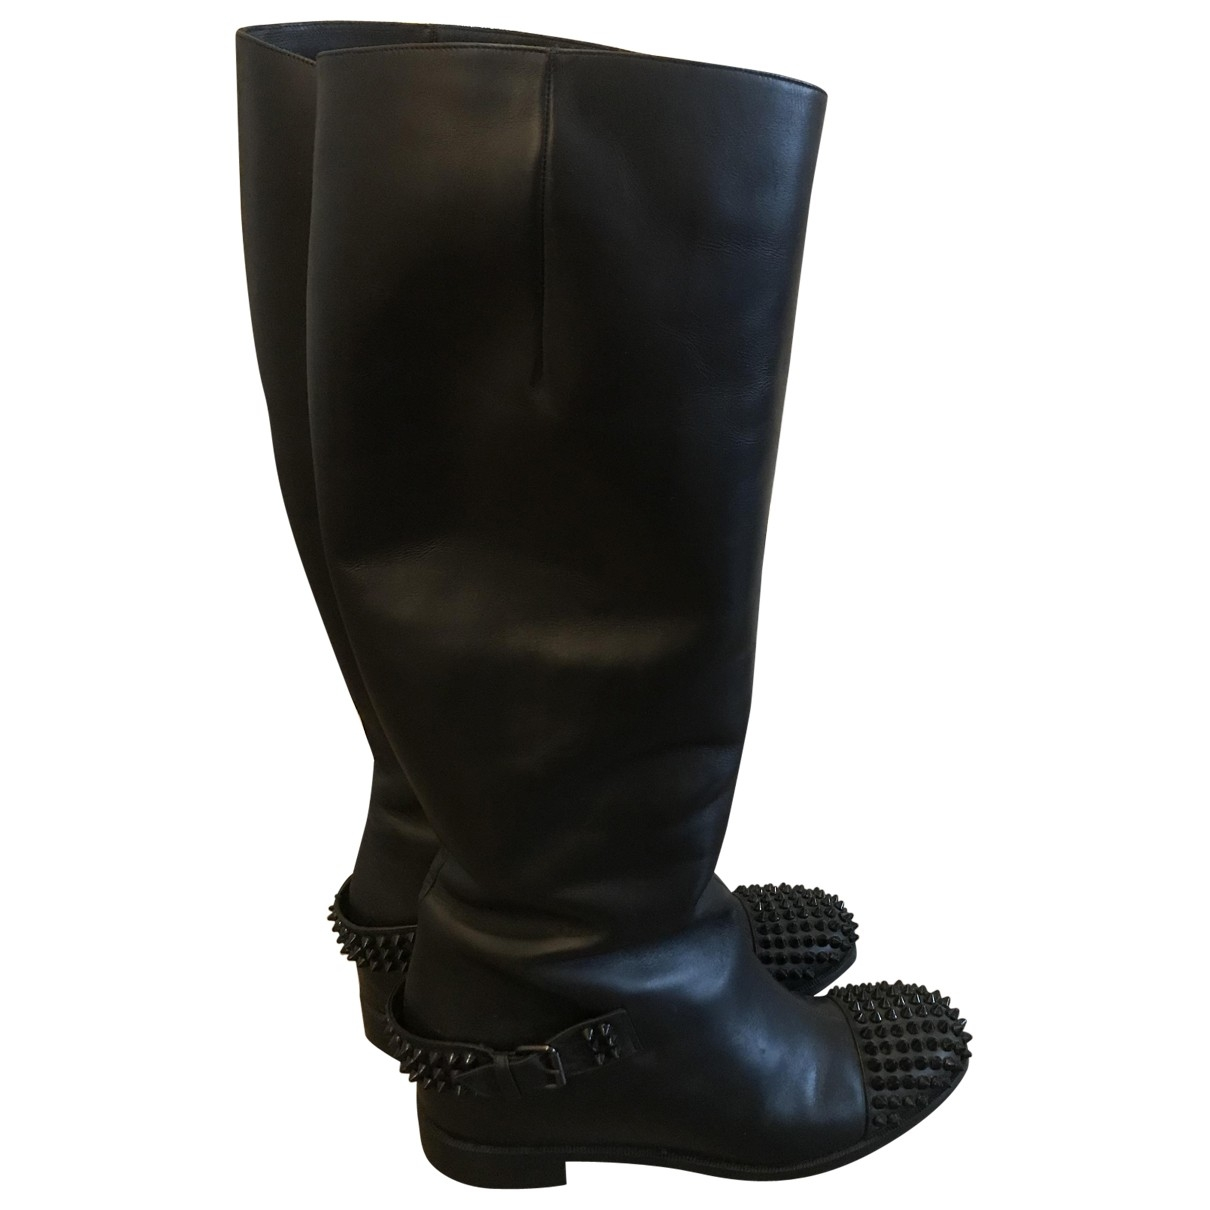 Christian Louboutin Egoutina Black Leather Boots for Women 39.5 EU